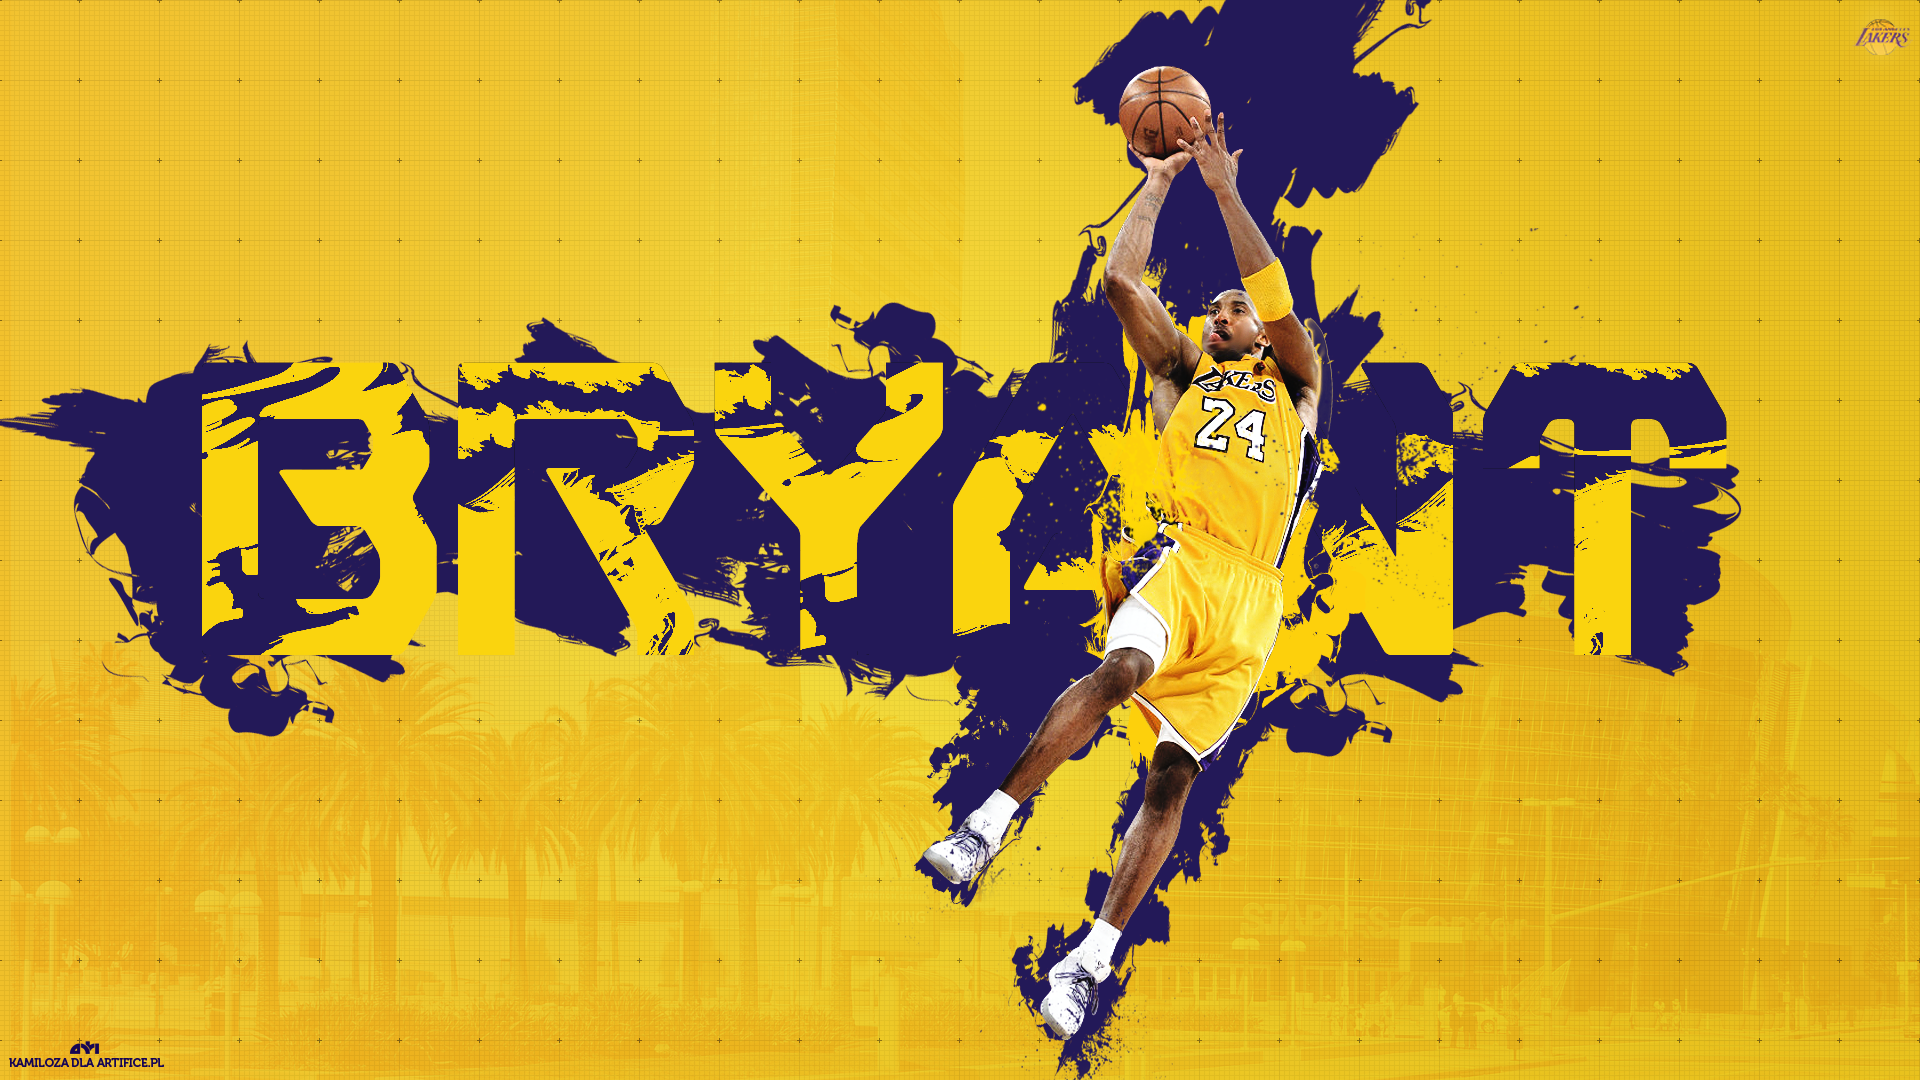 Kobe bryant hd wallpaper background image 1920x1080 - Kobe bryant wallpaper free download ...